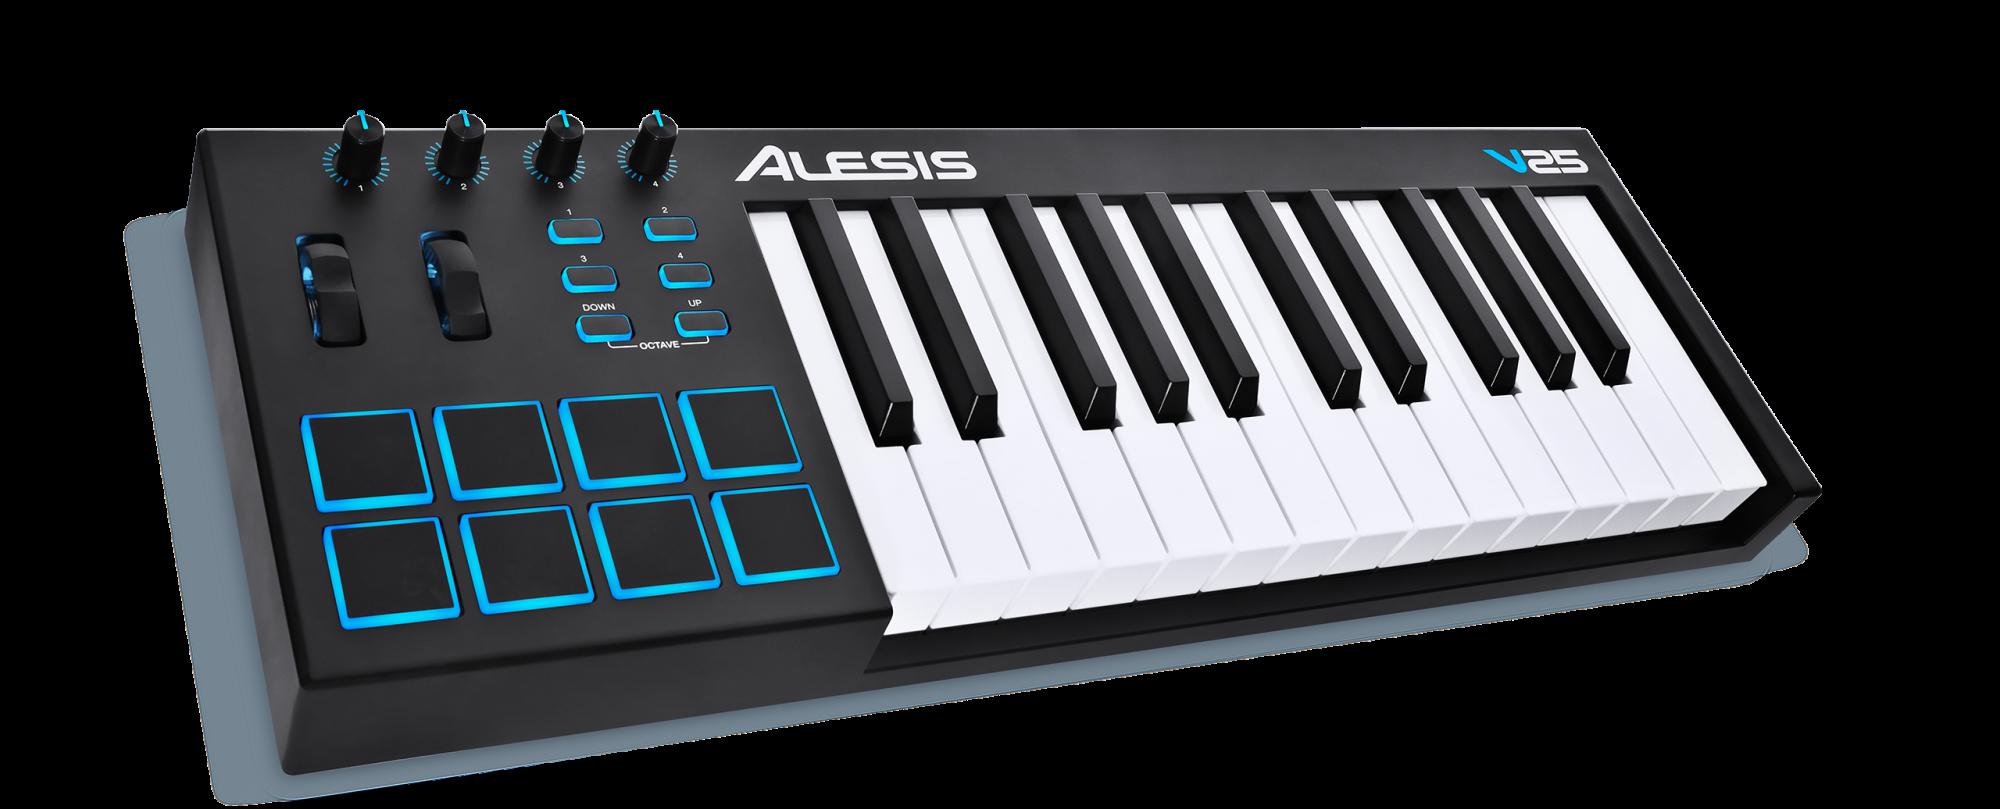 Alesis V25 25 Key USB MIDI Music Keyboard w/ Pads